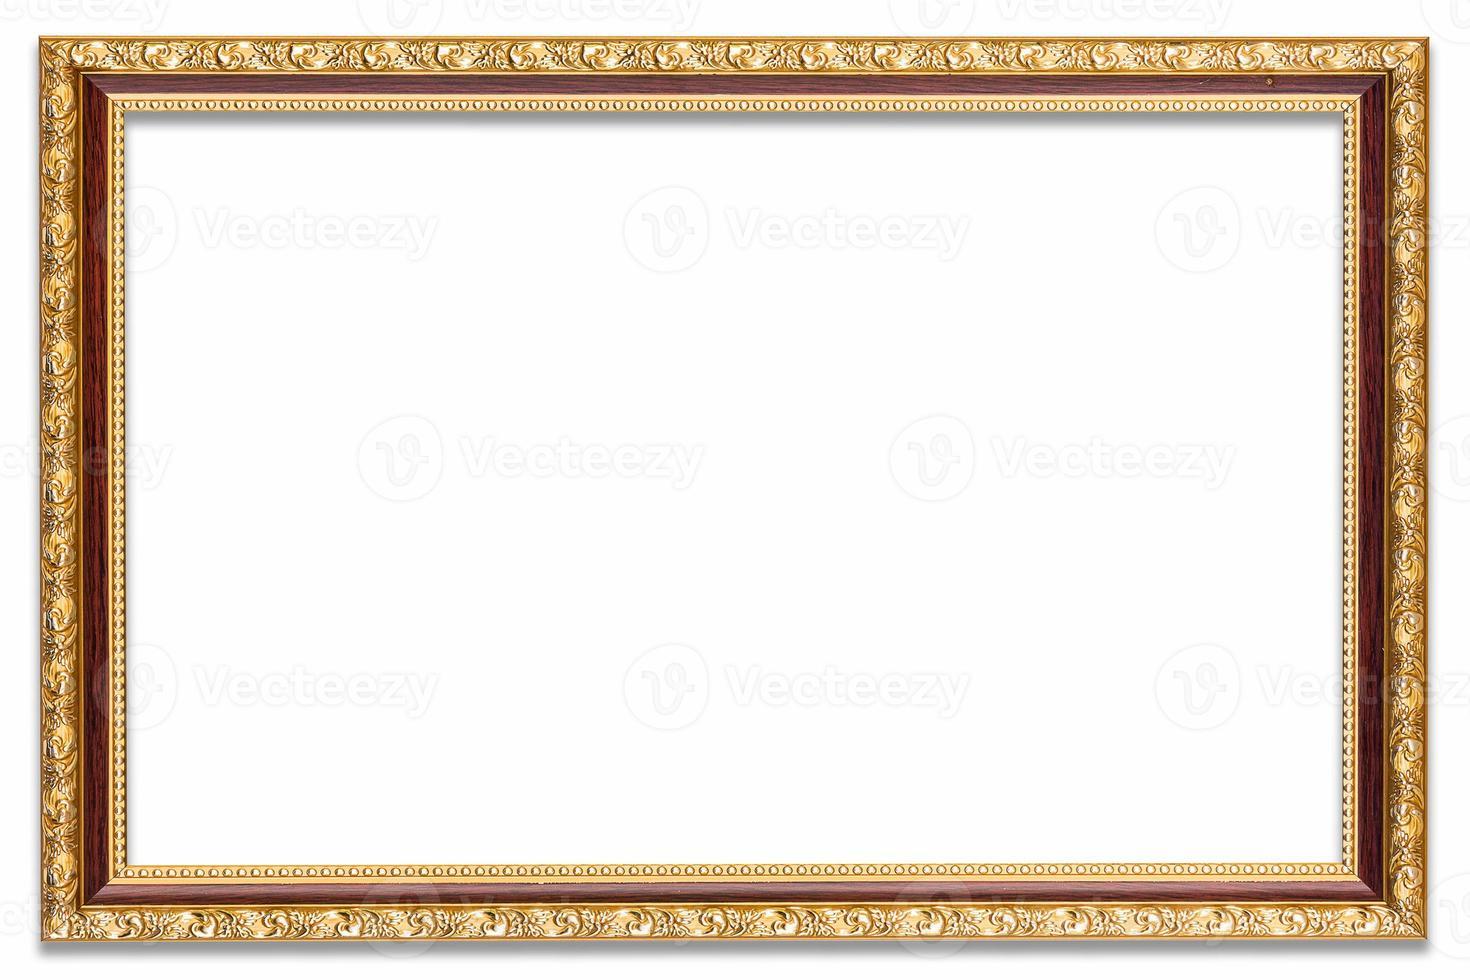 foto do quadro na sombra branca isolada.